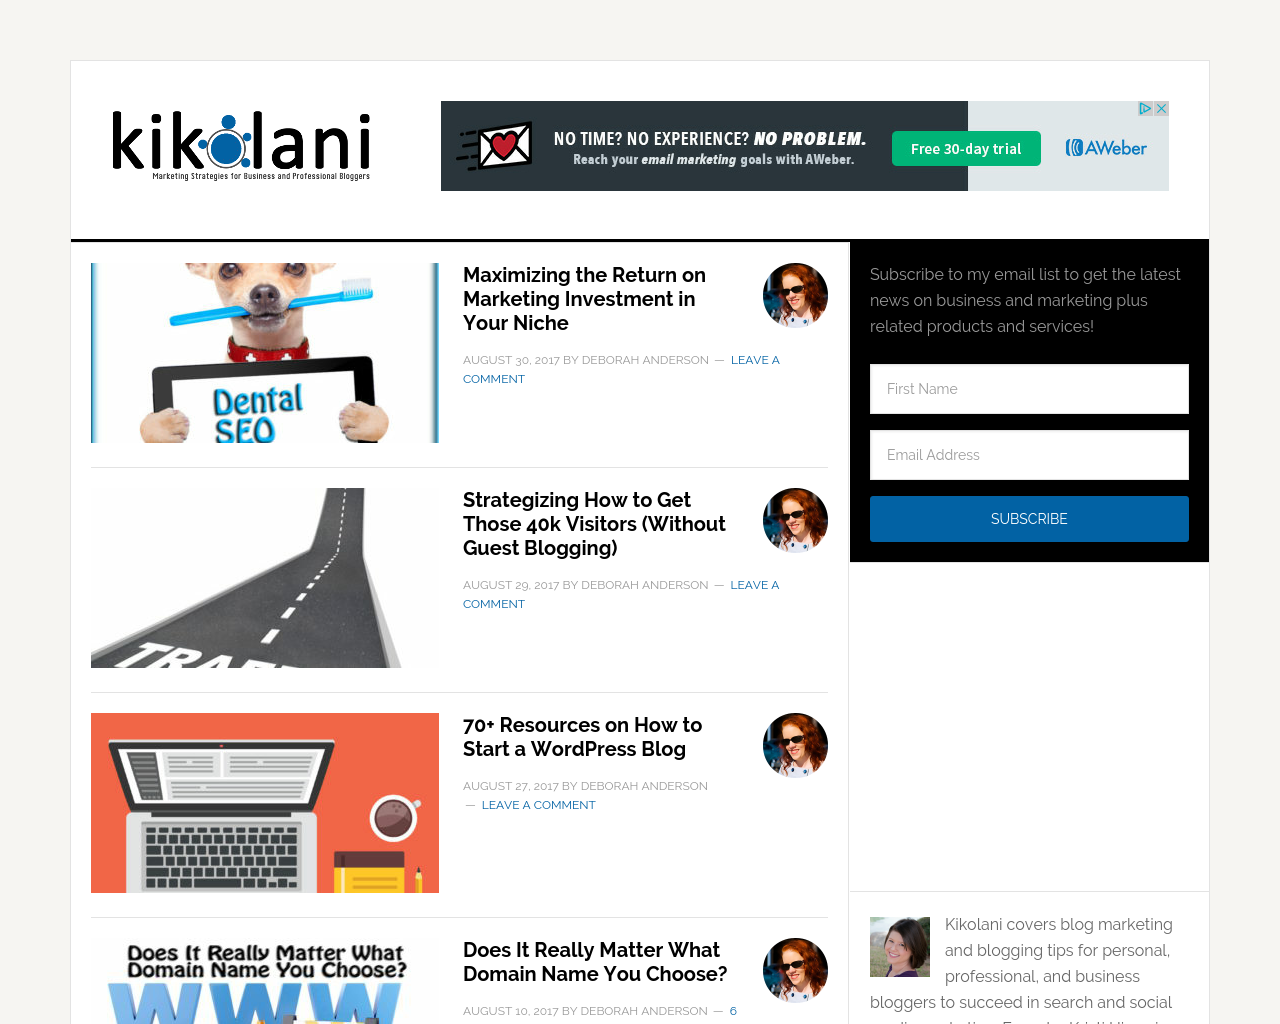 Kikolani-Advertising-Reviews-Pricing